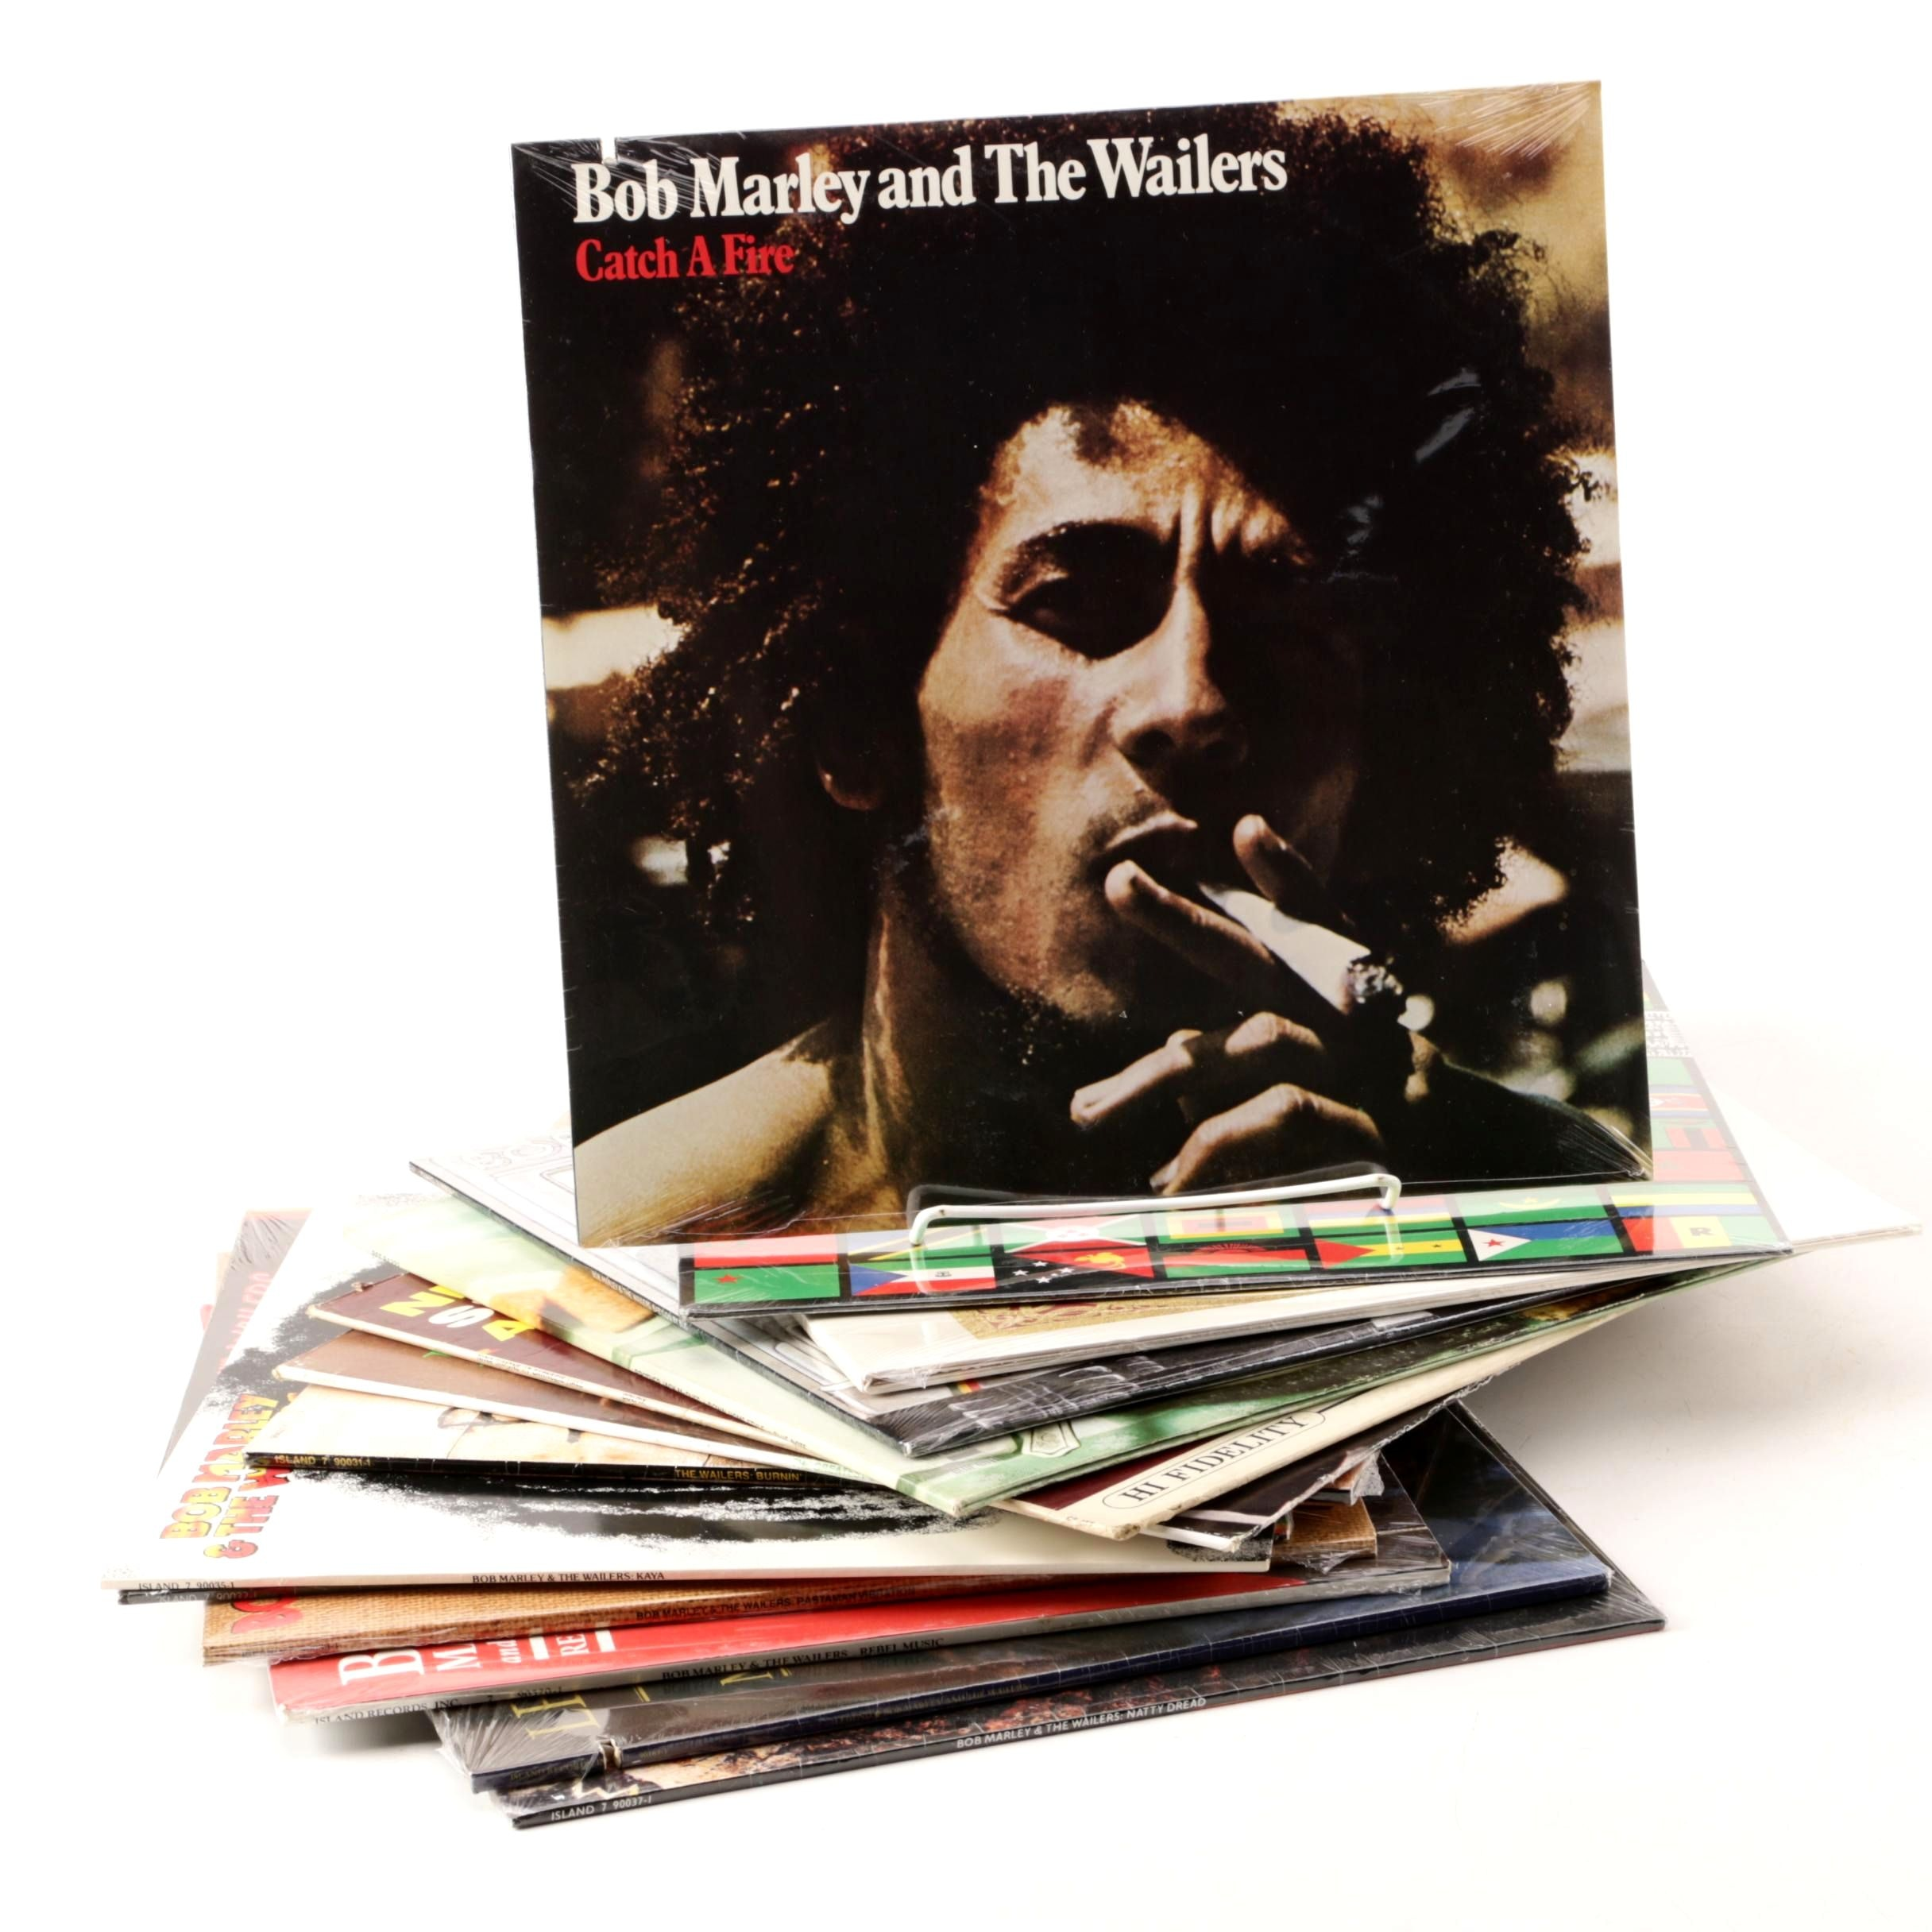 Reggae and Jazz Vinyl LPs including Bob Marley, Nina Simone and Louis Armstrong